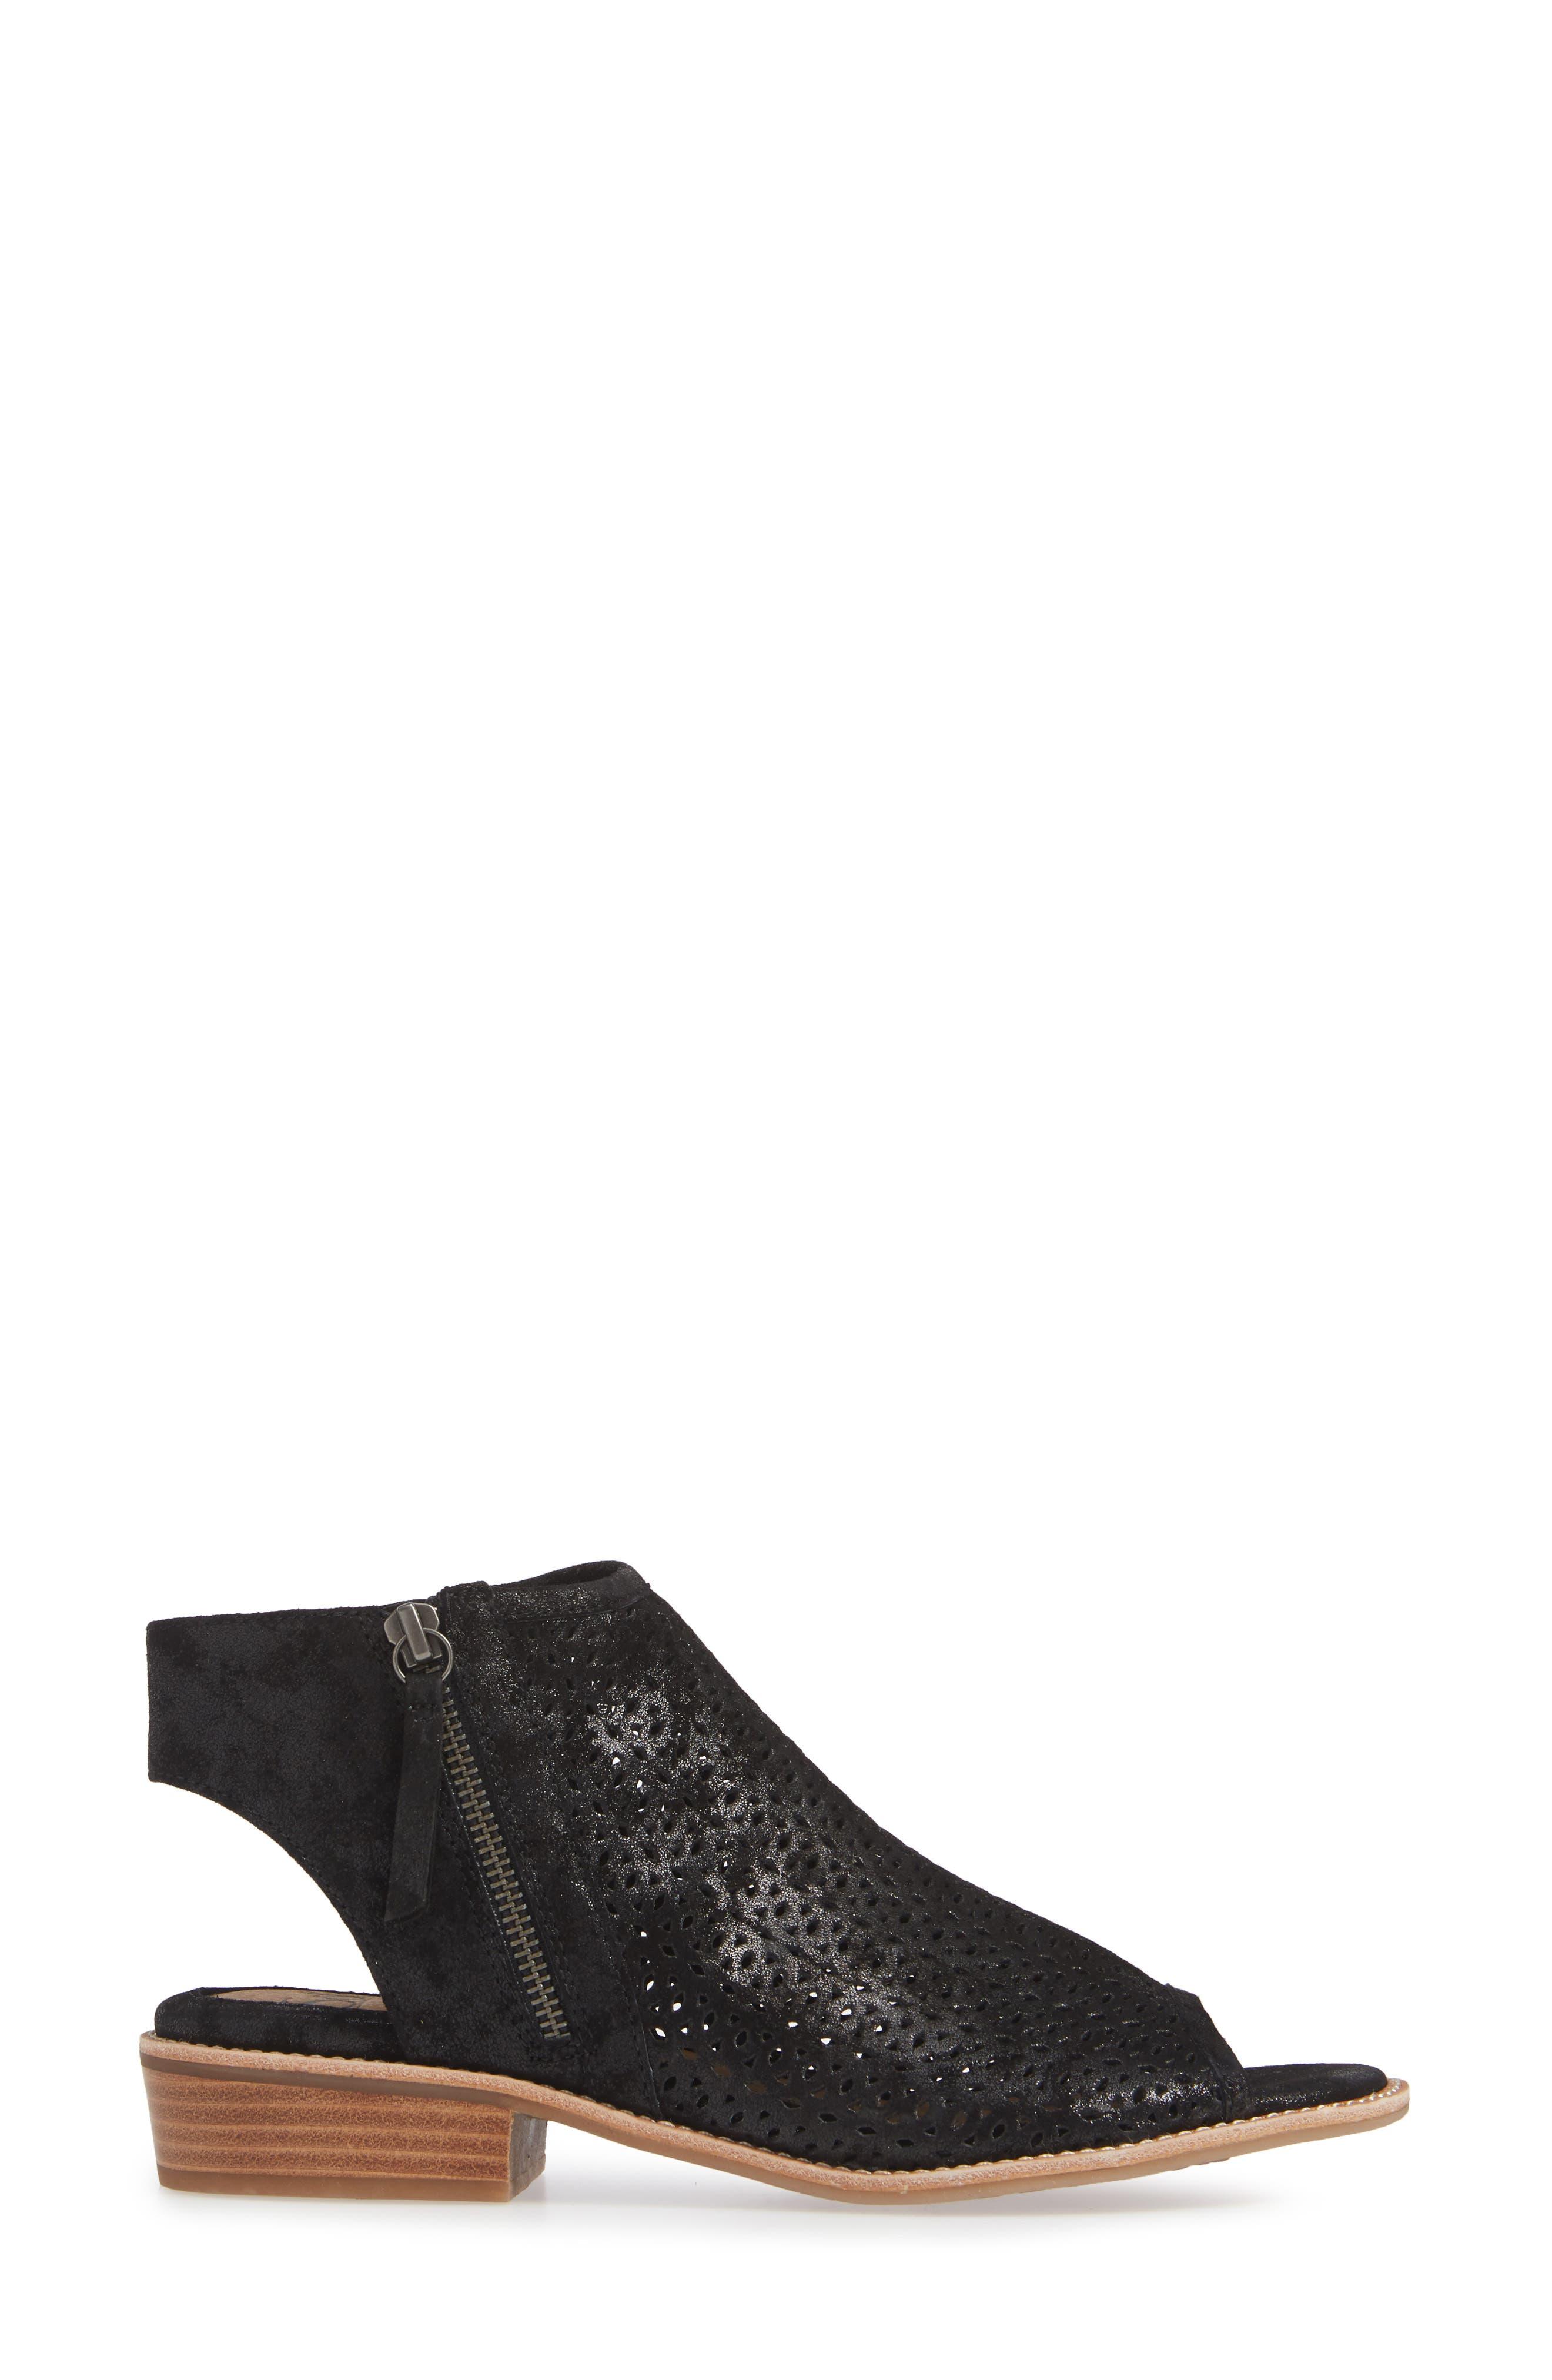 Natesa Perforated Sandal,                             Alternate thumbnail 3, color,                             BLACK SUEDE